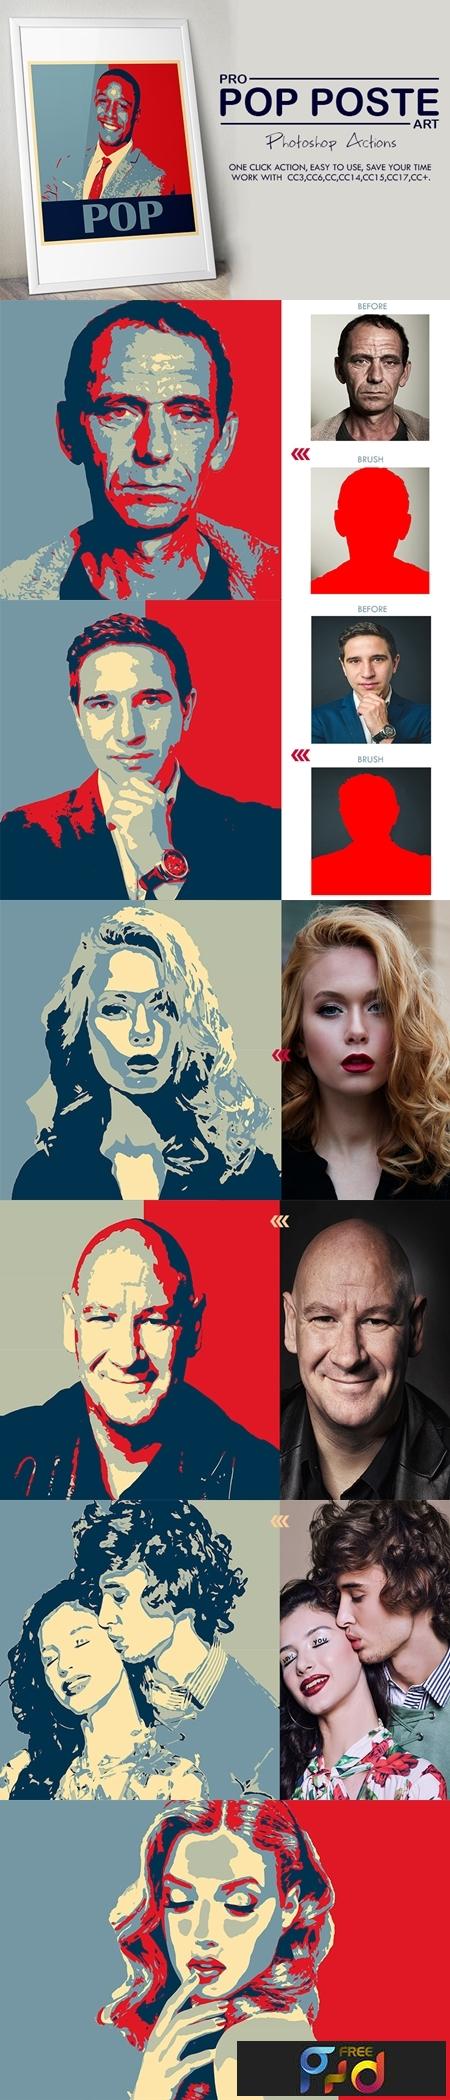 Pro Pop Poster Art Photoshop Actions 3535655 1